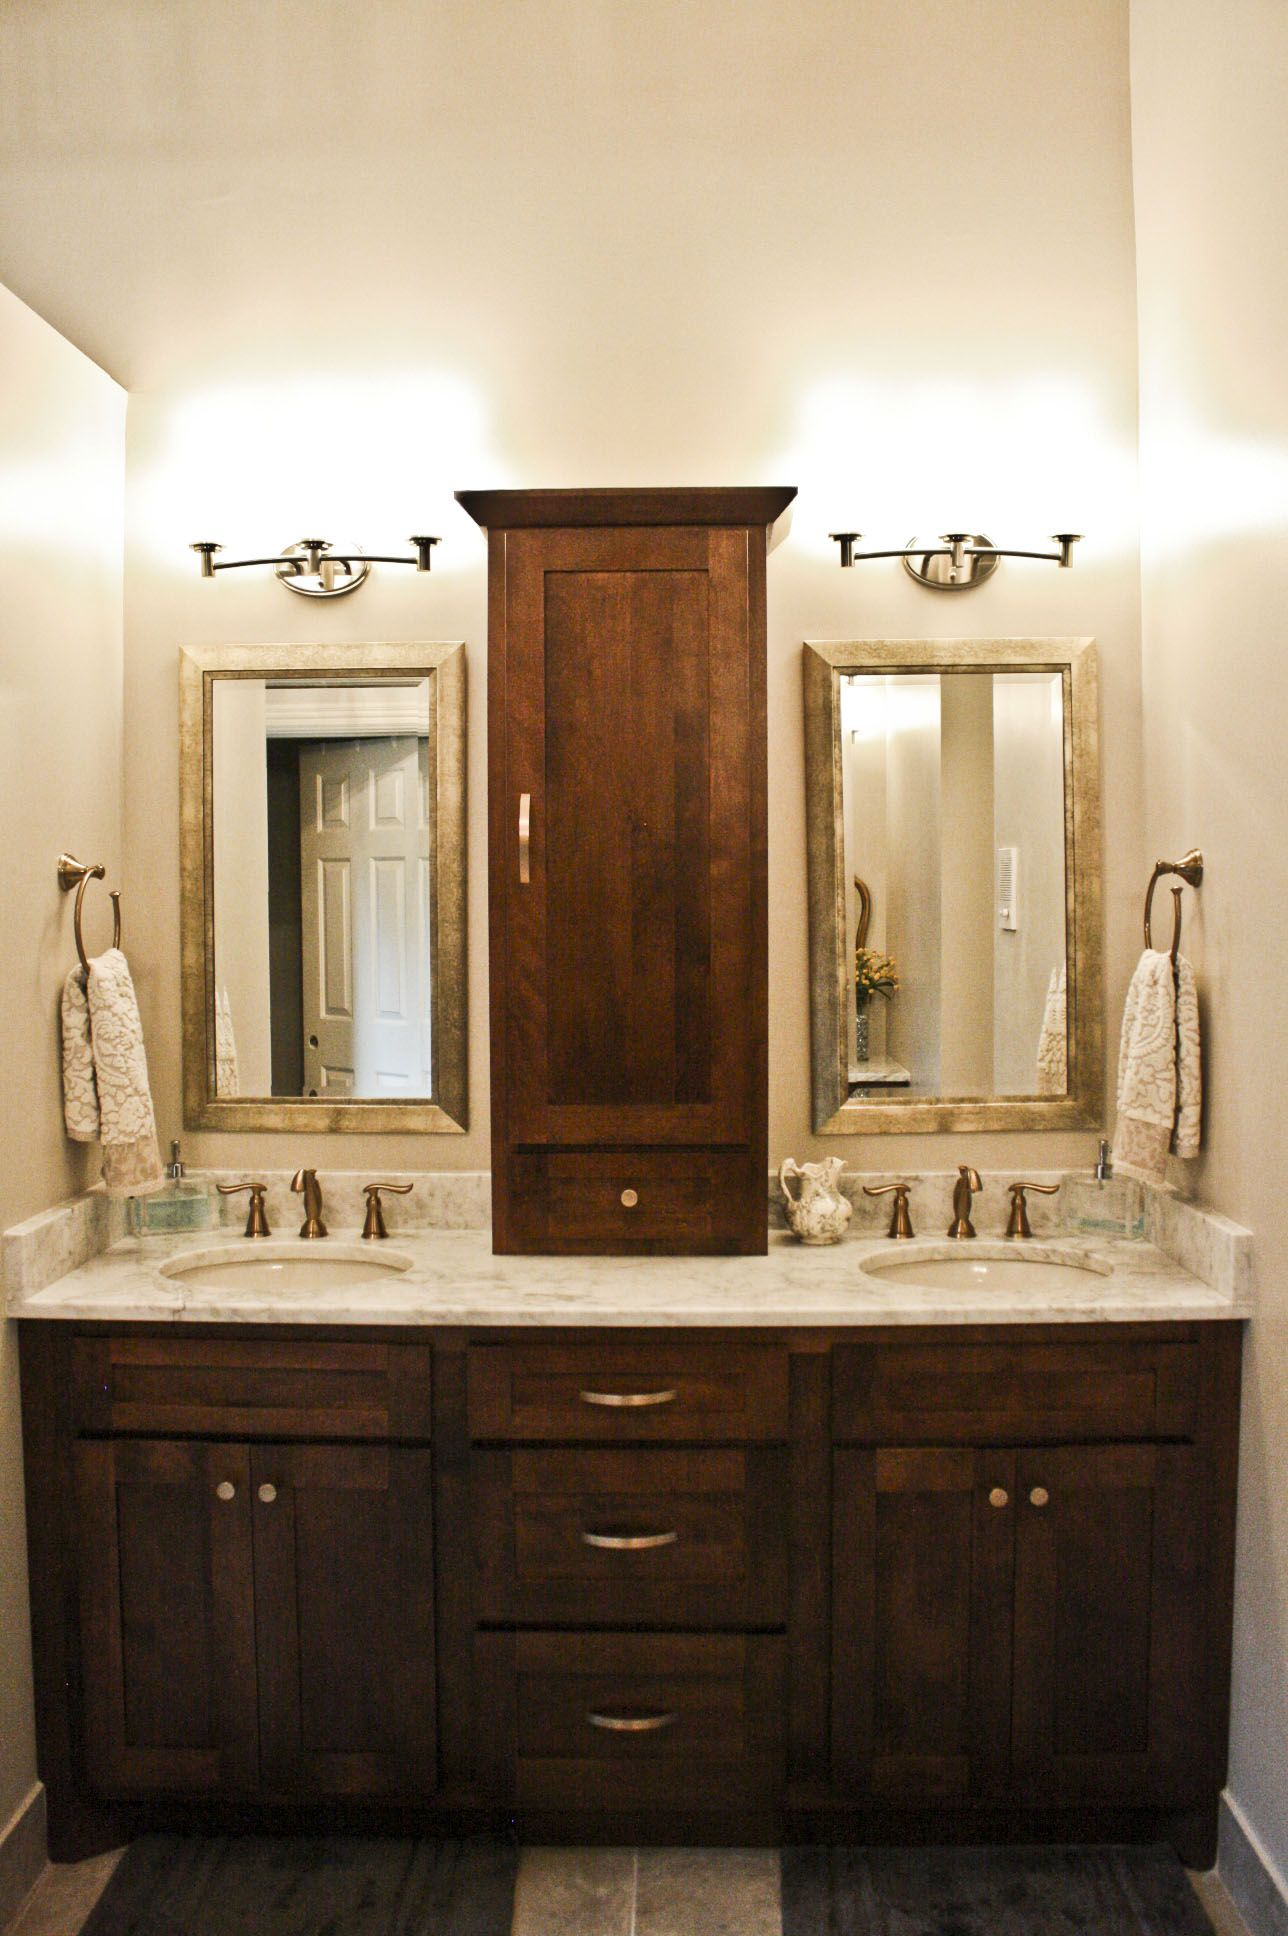 Koch Classic cabinetry. Seneca raised panel door style. Mocha ...